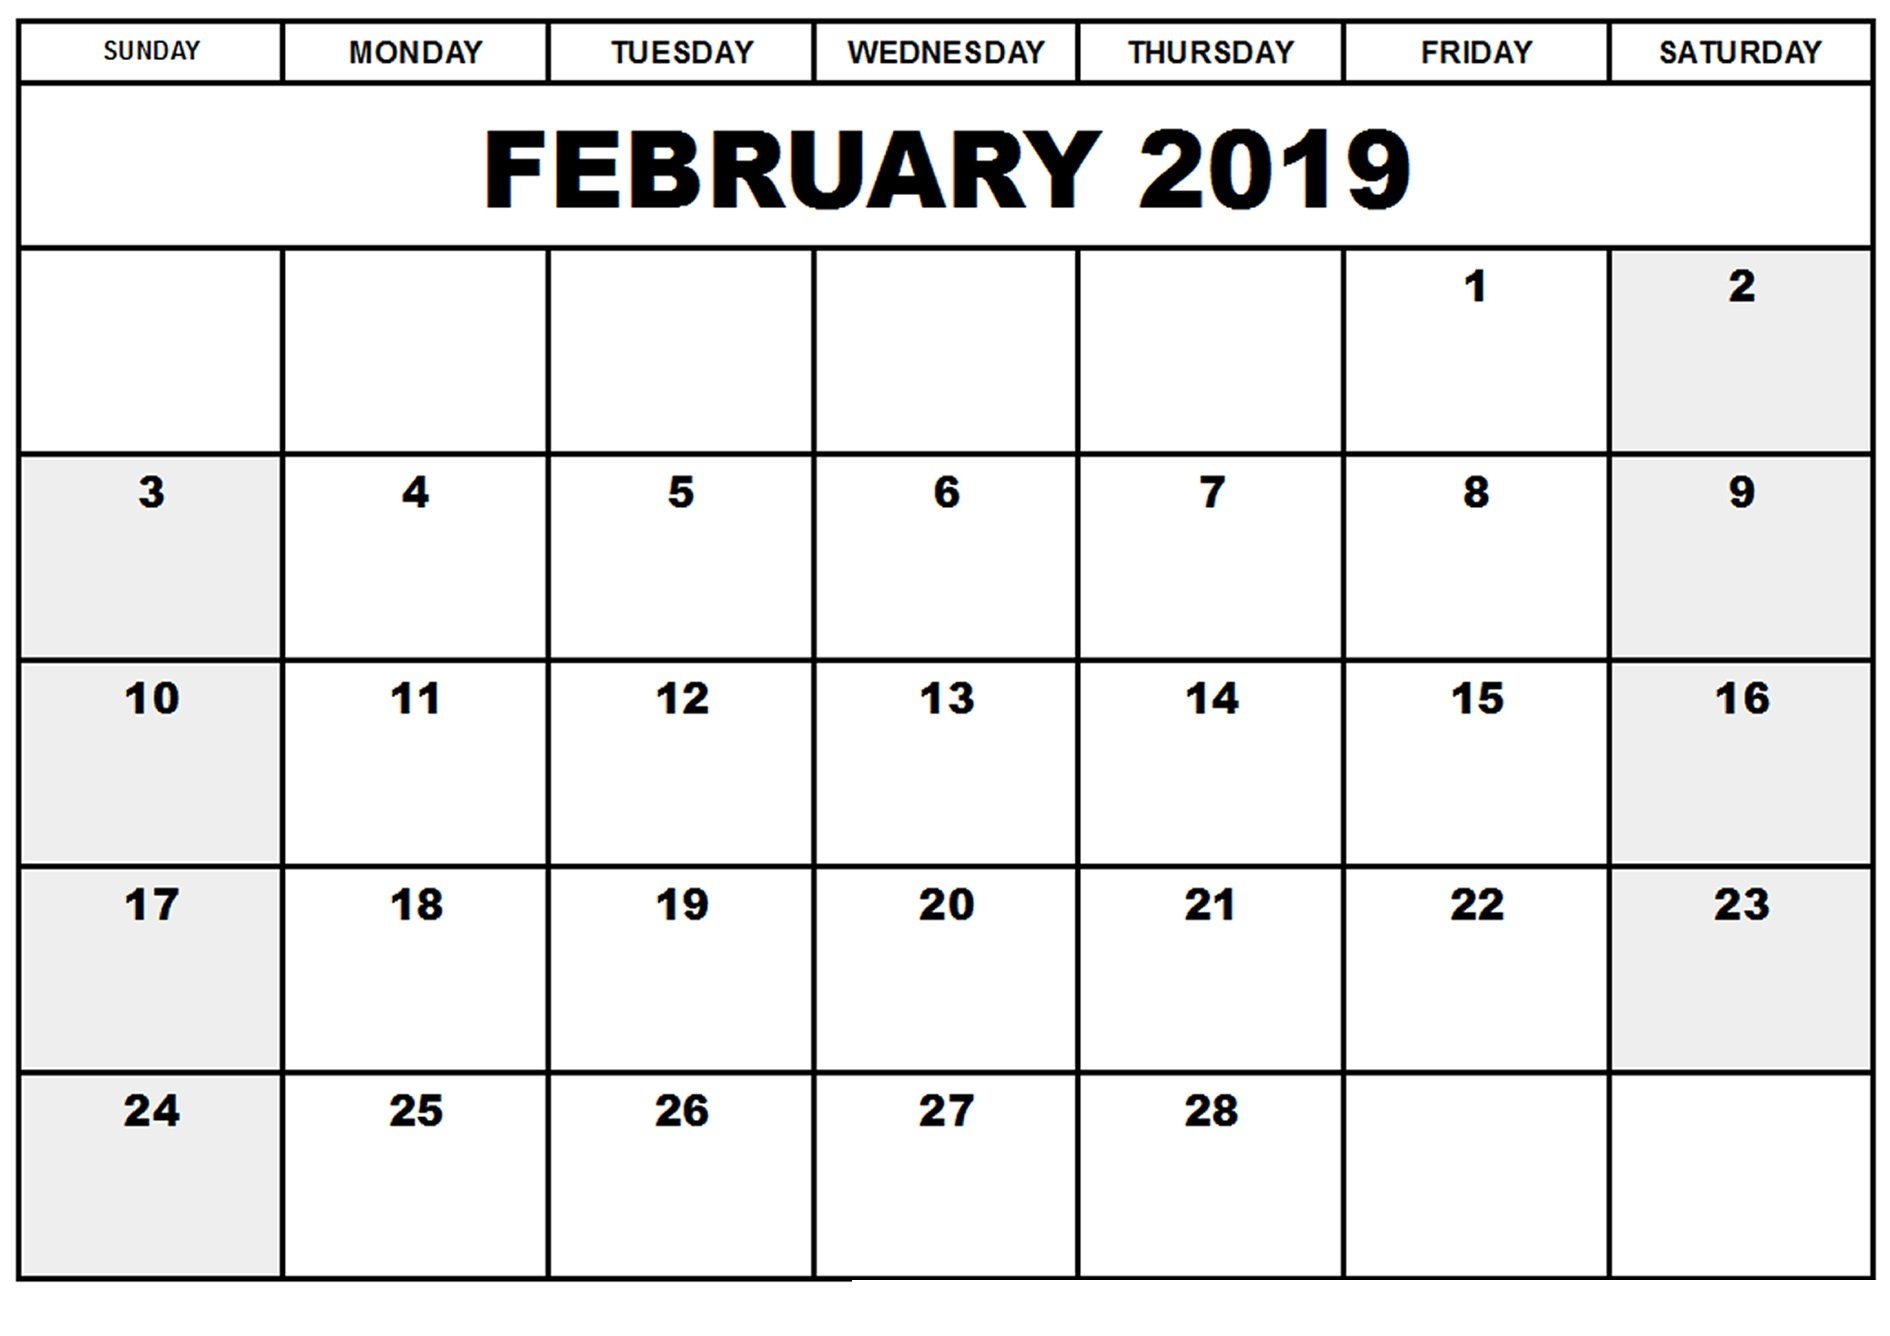 Free Blank A4 February 2019 Calendar Pdf, Excel, Word   Template Calendar 2019 Download Word